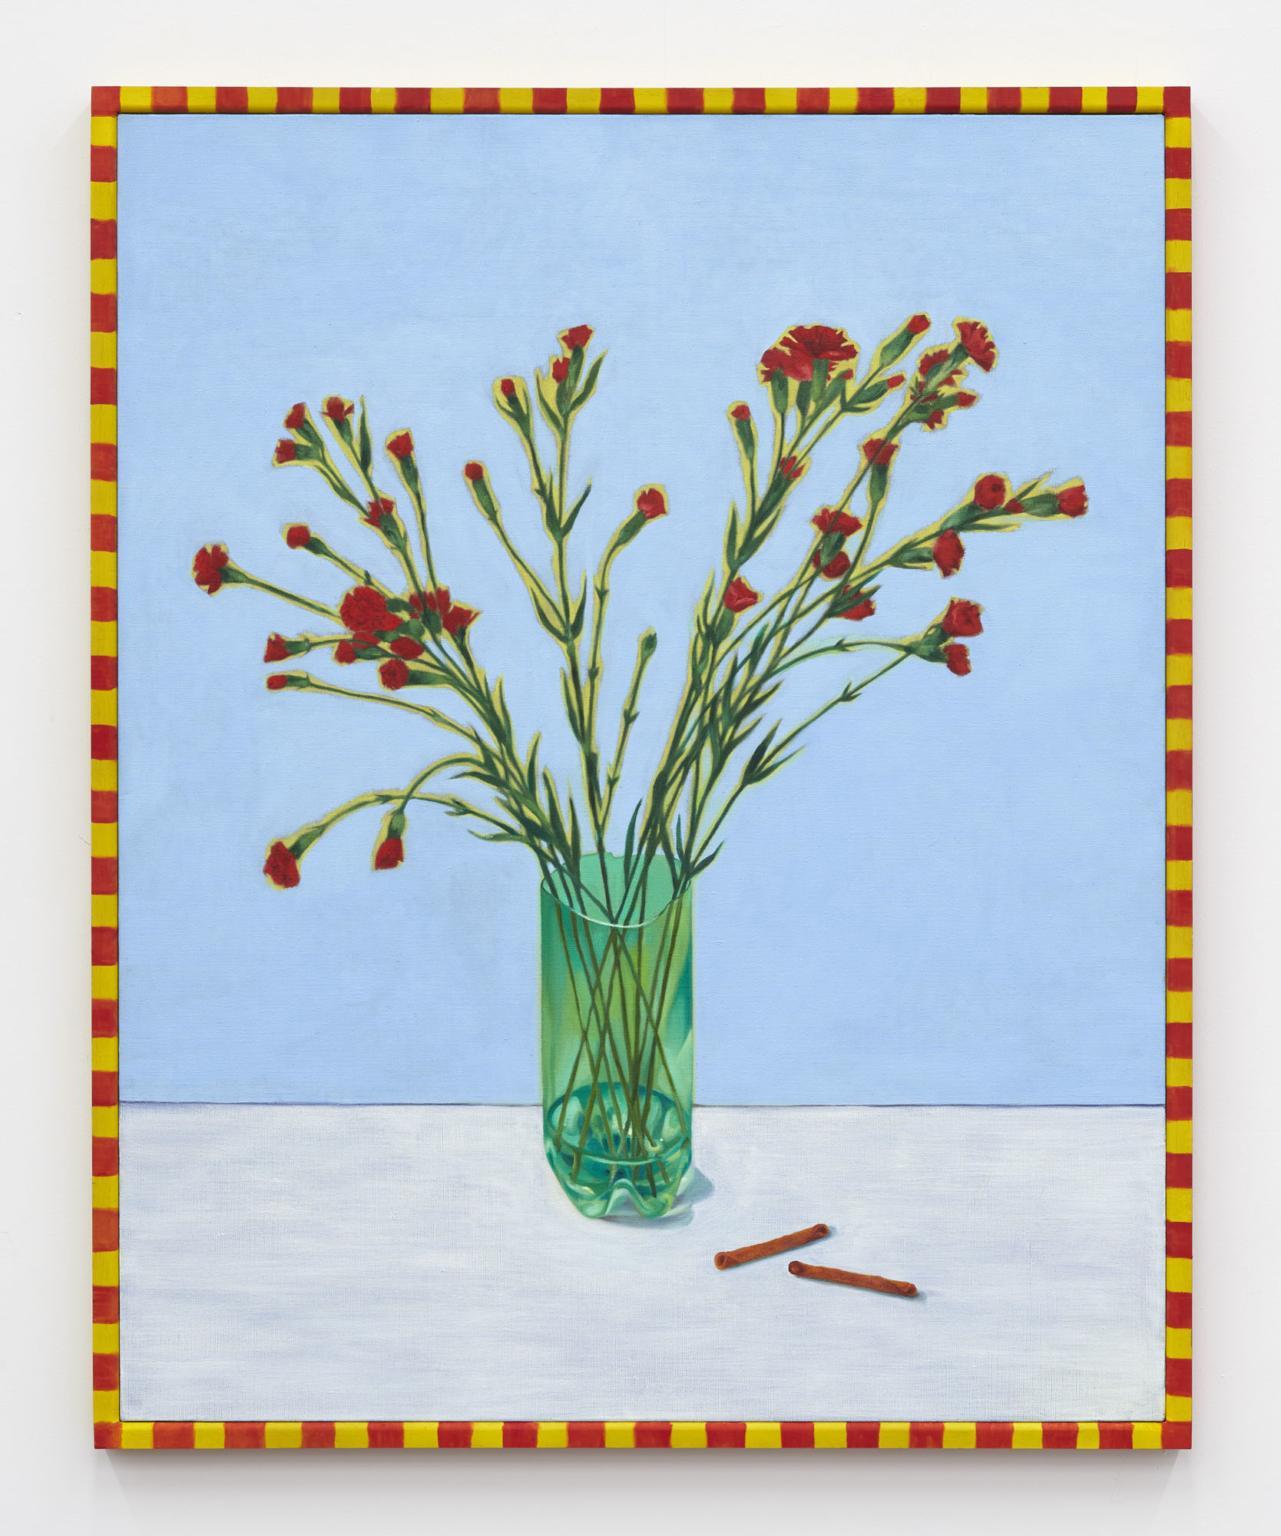 Nicole Eisenman,/Still Life with Takis/, 2020, oil on linen with artist's  frame, 106 × 85.1 × 3.2 cm